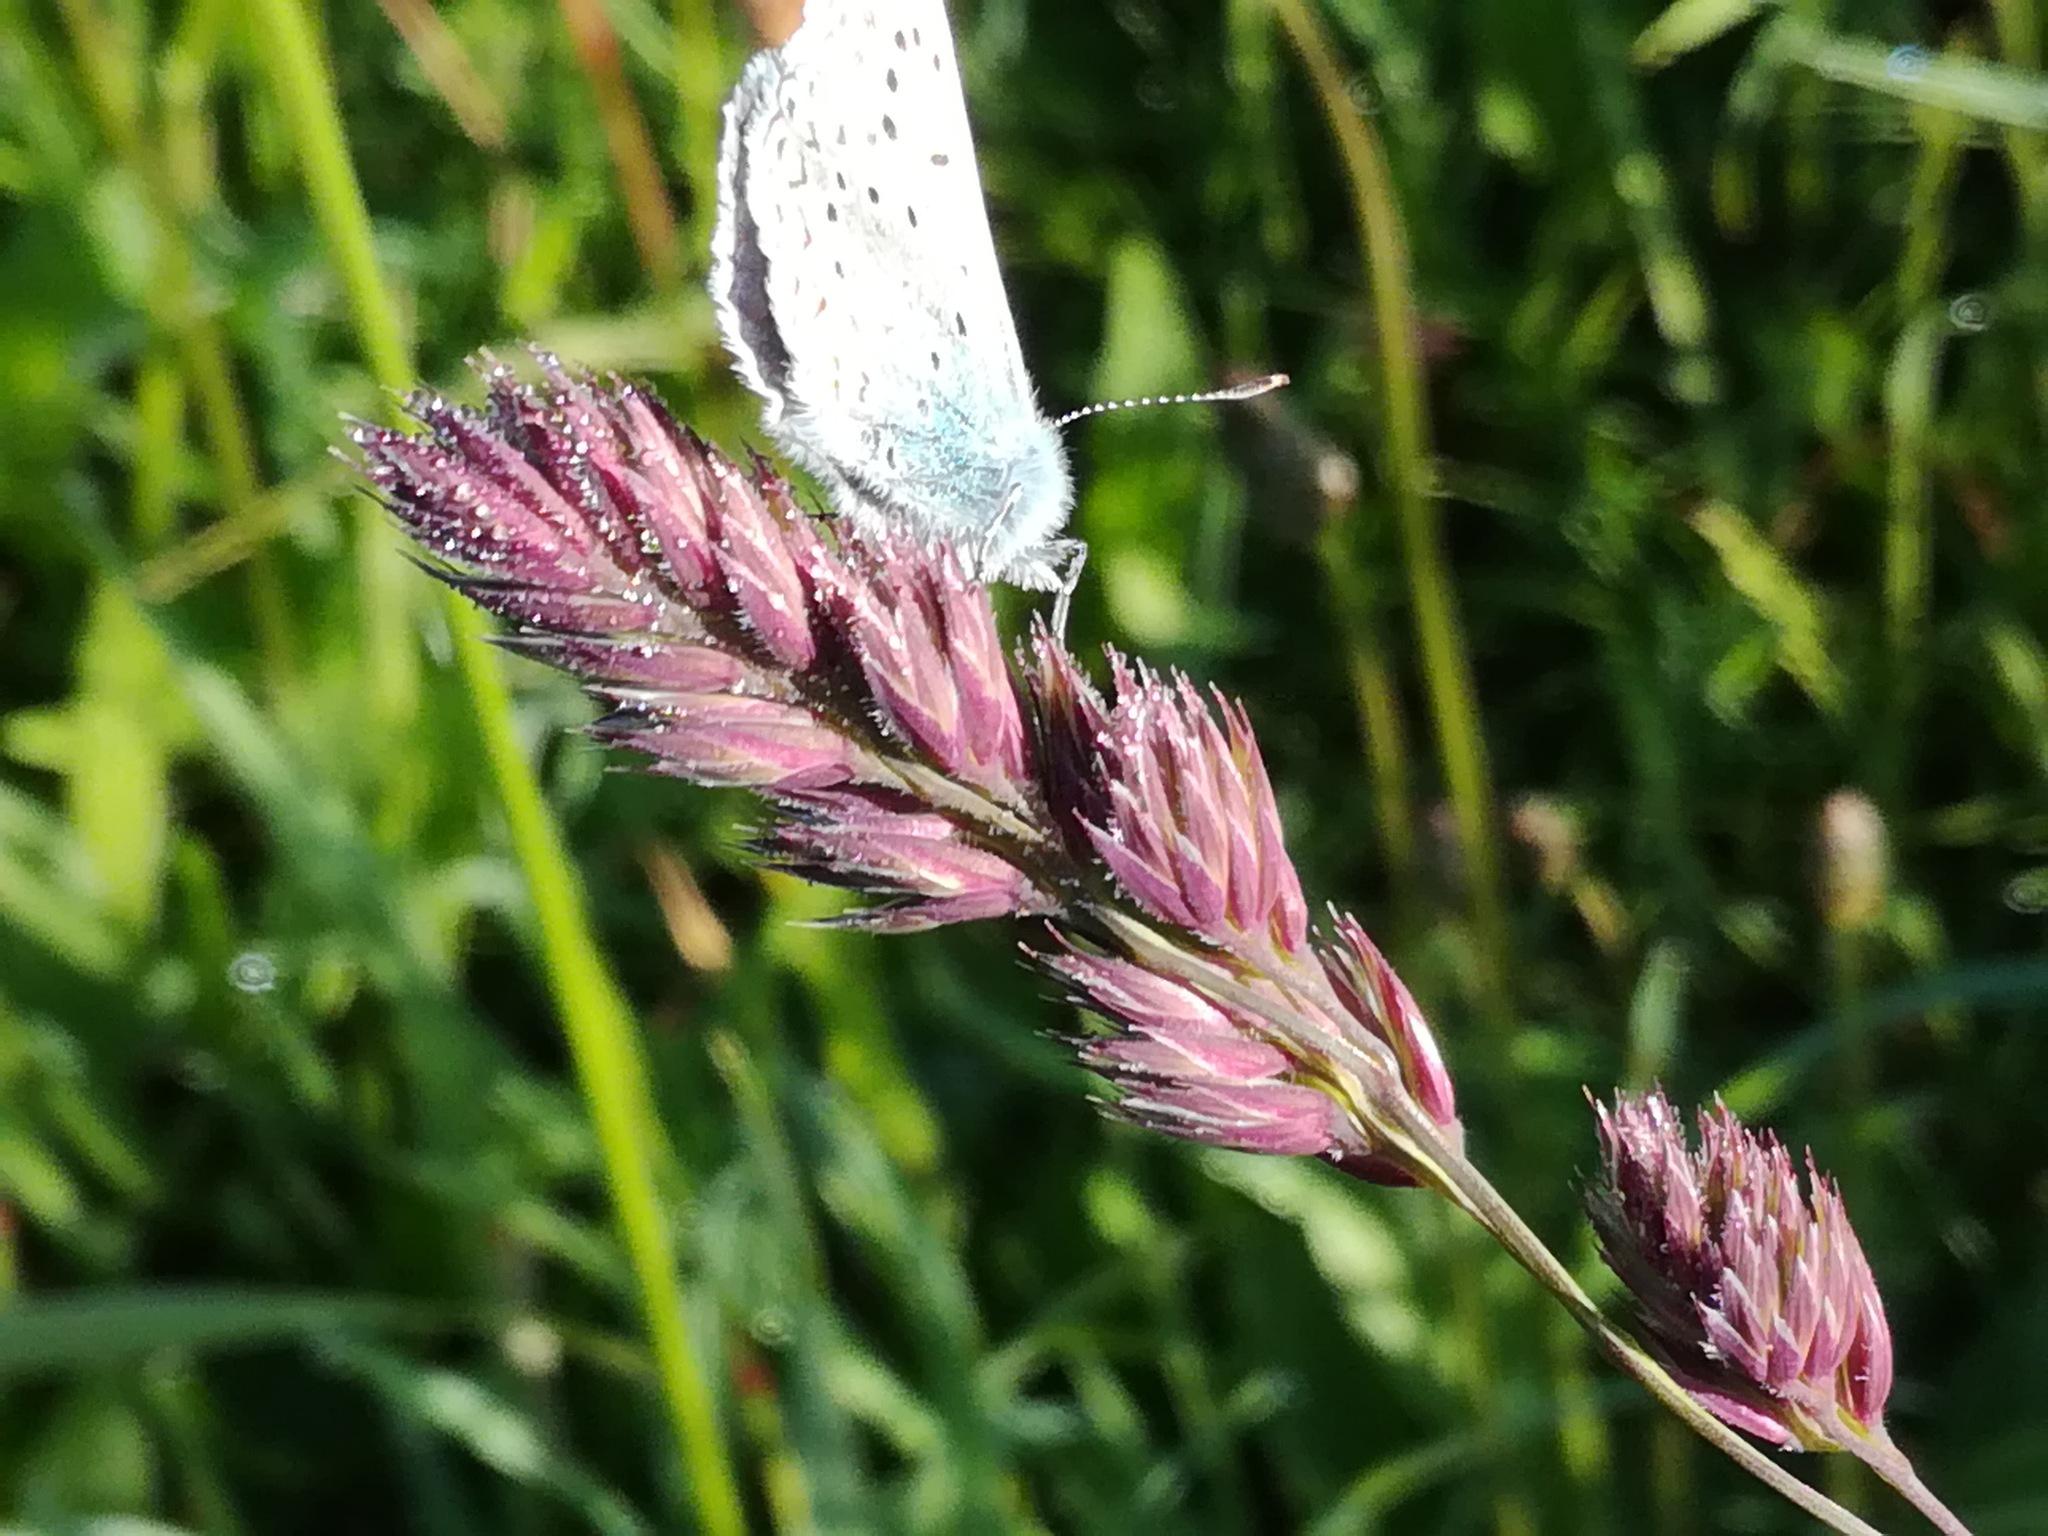 Grass with butterfly by uzkuraitiene62